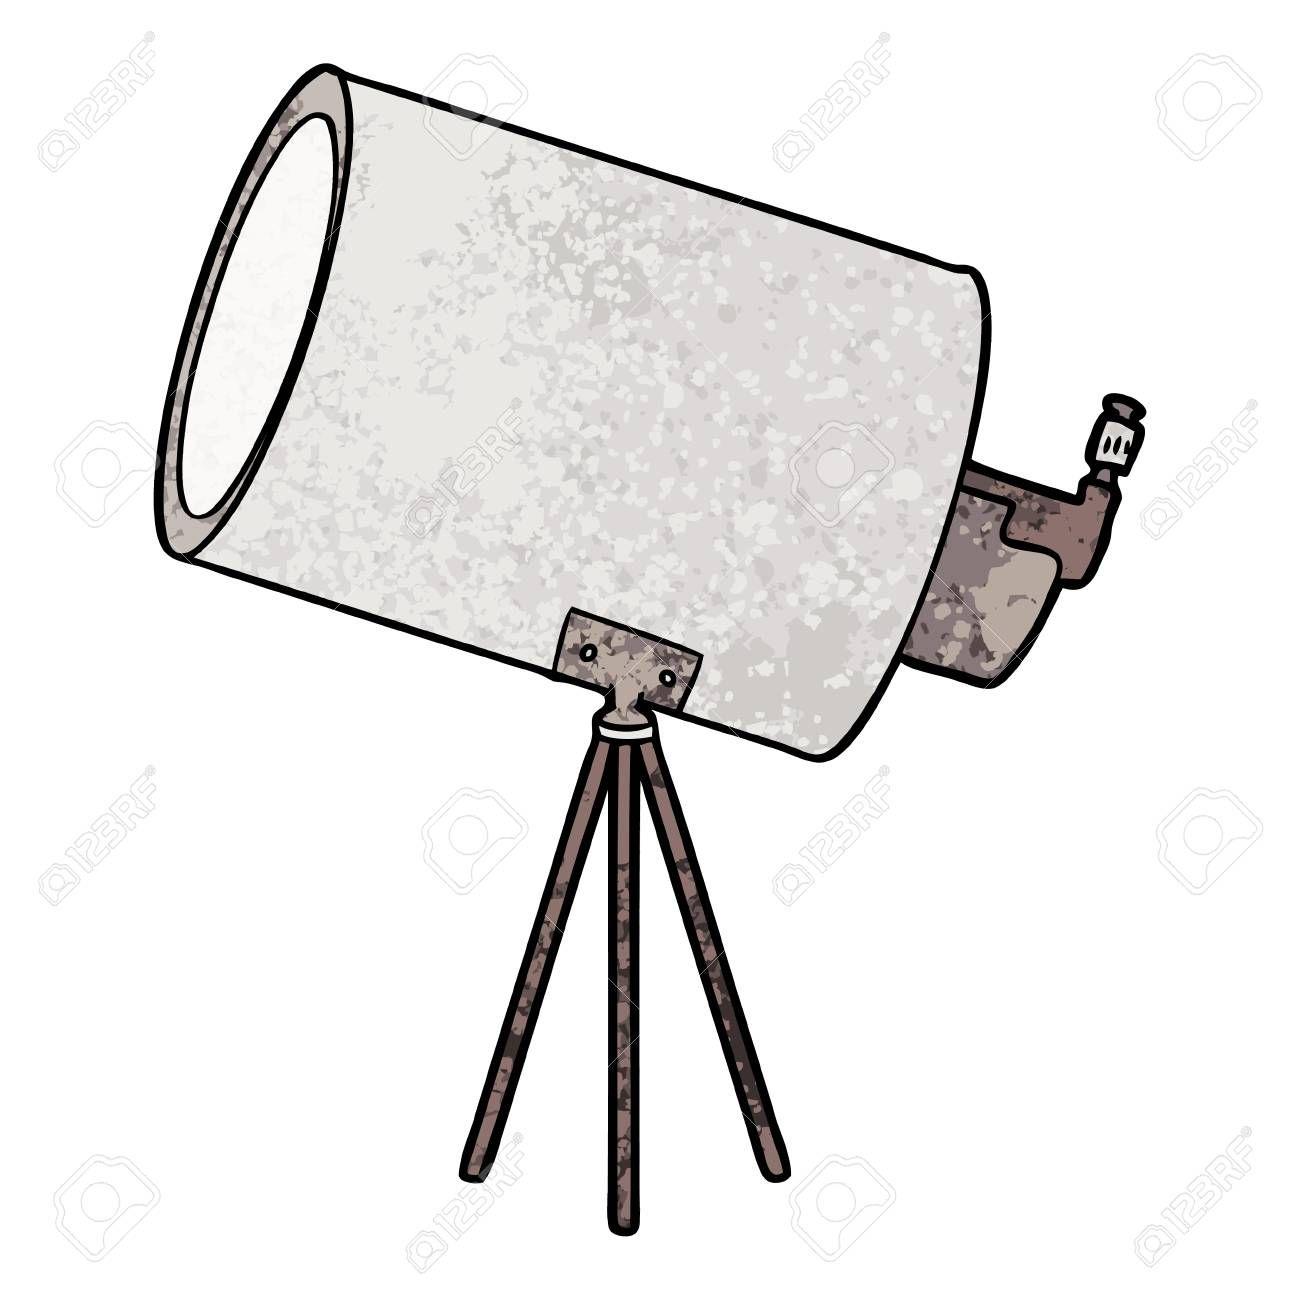 Cartoon Big Telescope Illustration Aff Big Cartoon Illustration Telescope Tripod Lamp Decor Lamp